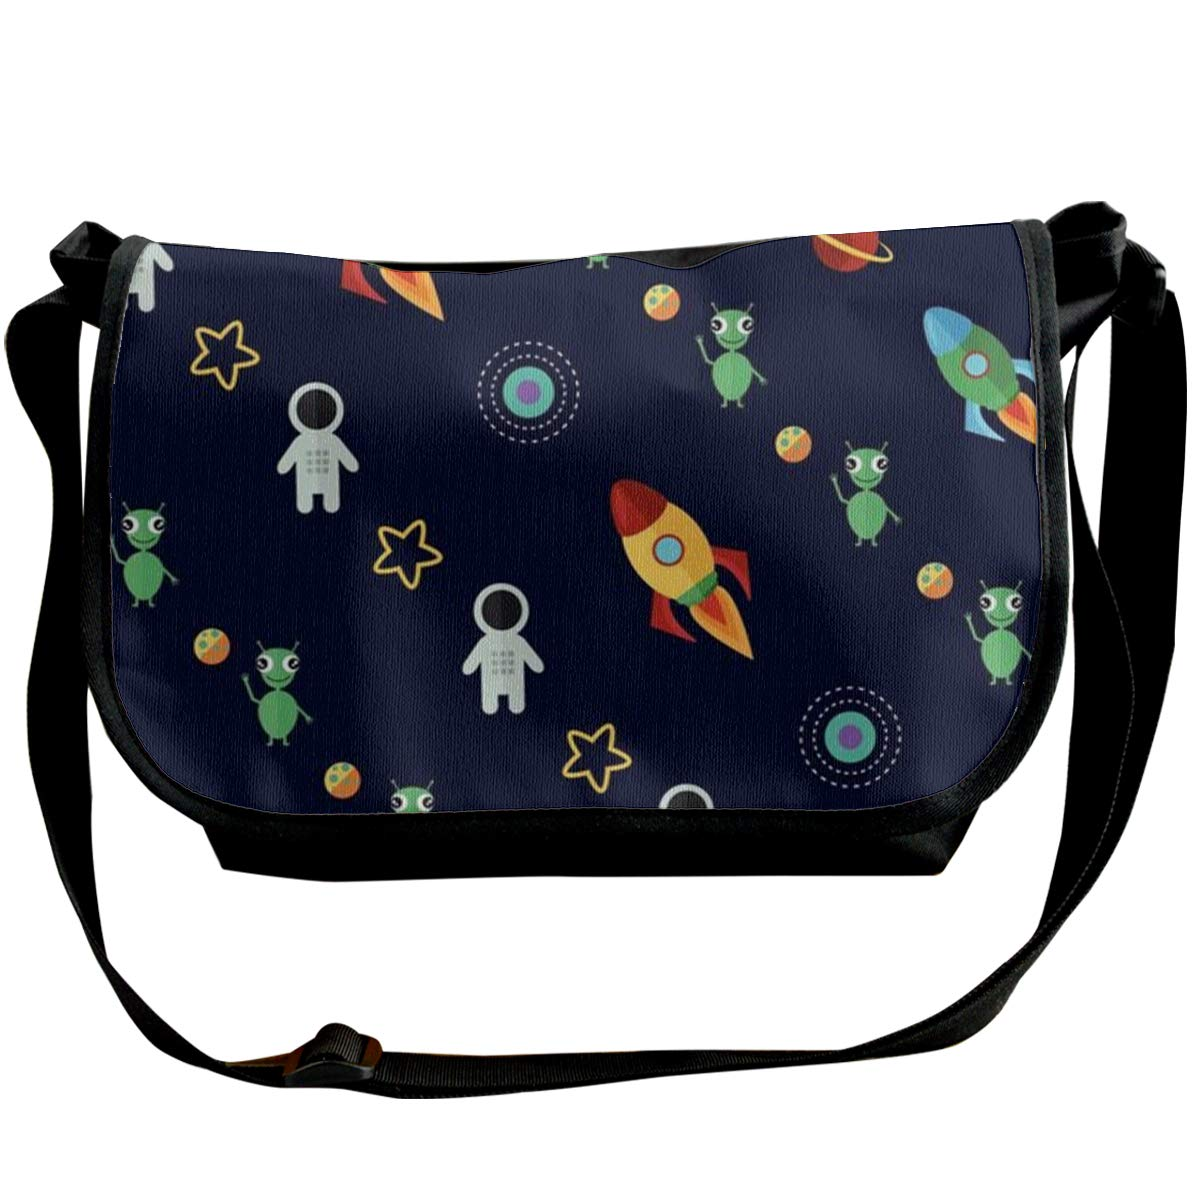 Futong Huaxia Rocket Boy Travel Messenger Bags Handbag Shoulder Bag Crossbody Bag Unisex